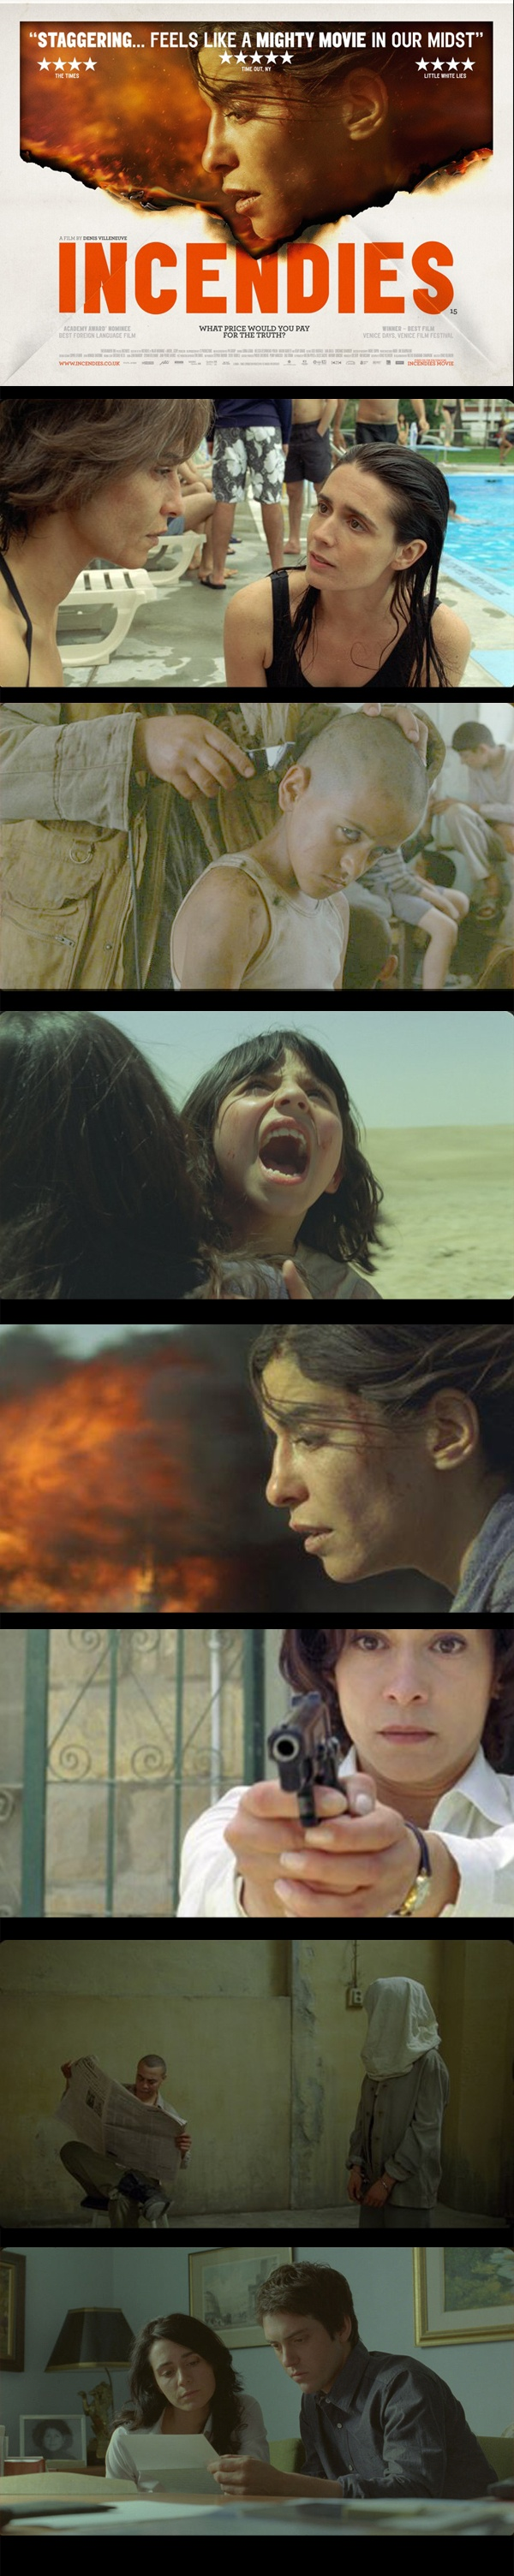 """-jeanne, one plus one, does it make one?"" Incendies by Denis Villeneuve (2010)"